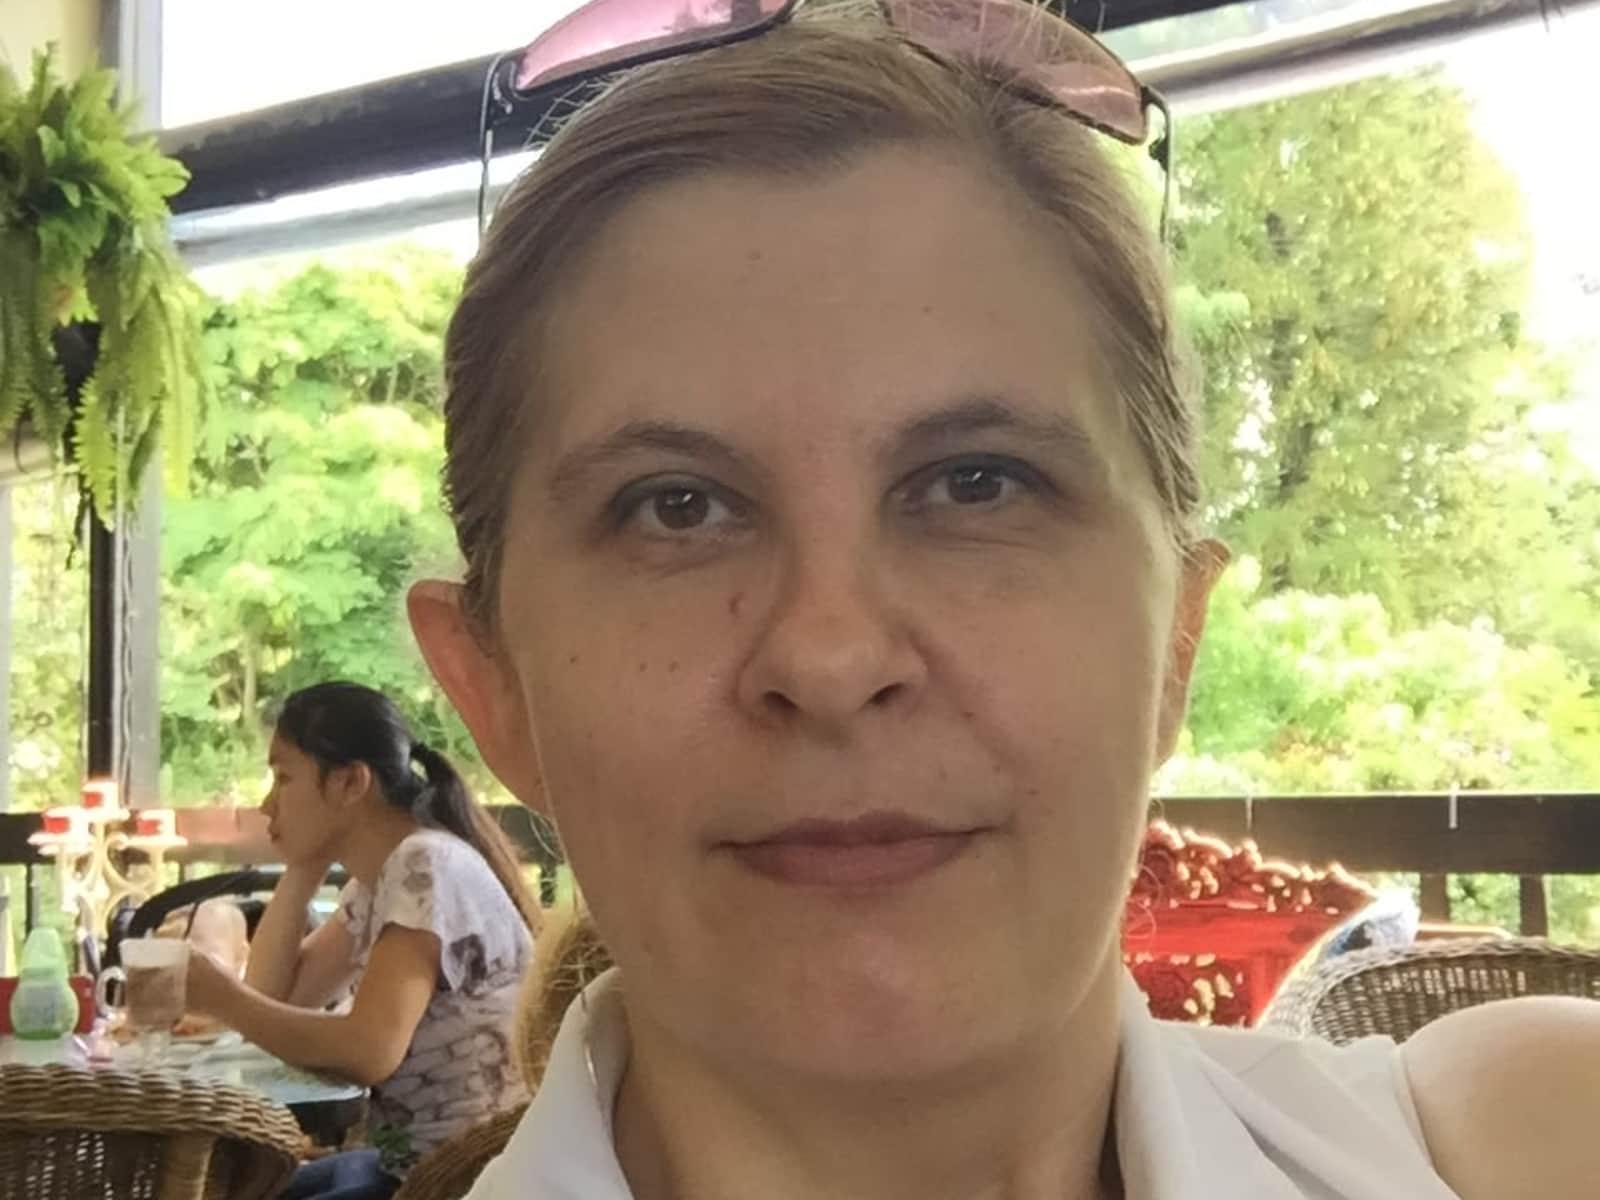 Judit from Budapest, Hungary